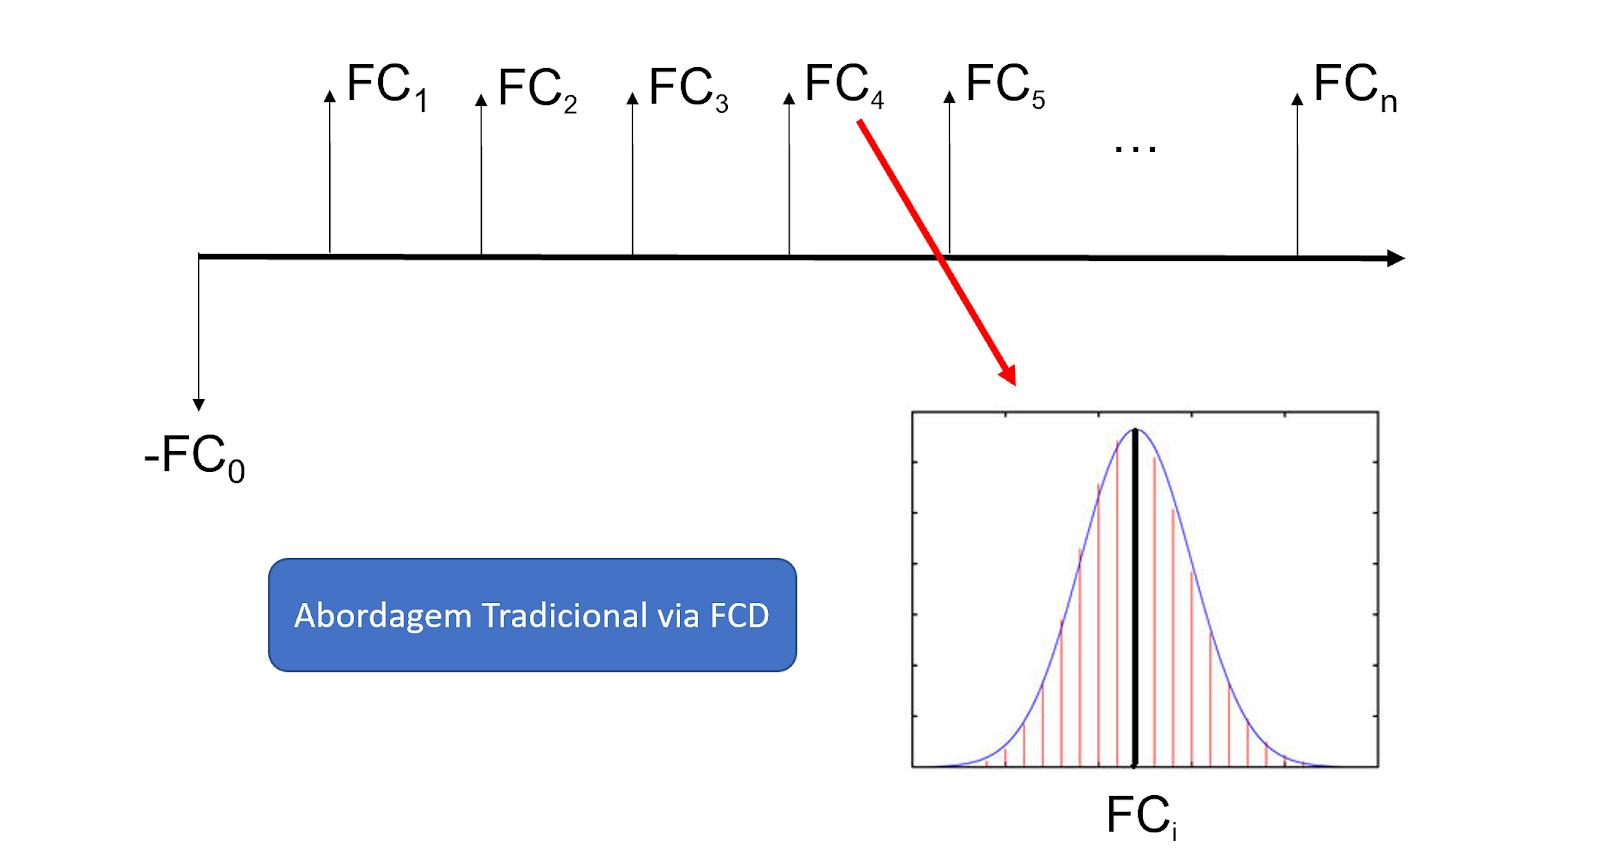 FCD: abordagem tradicional